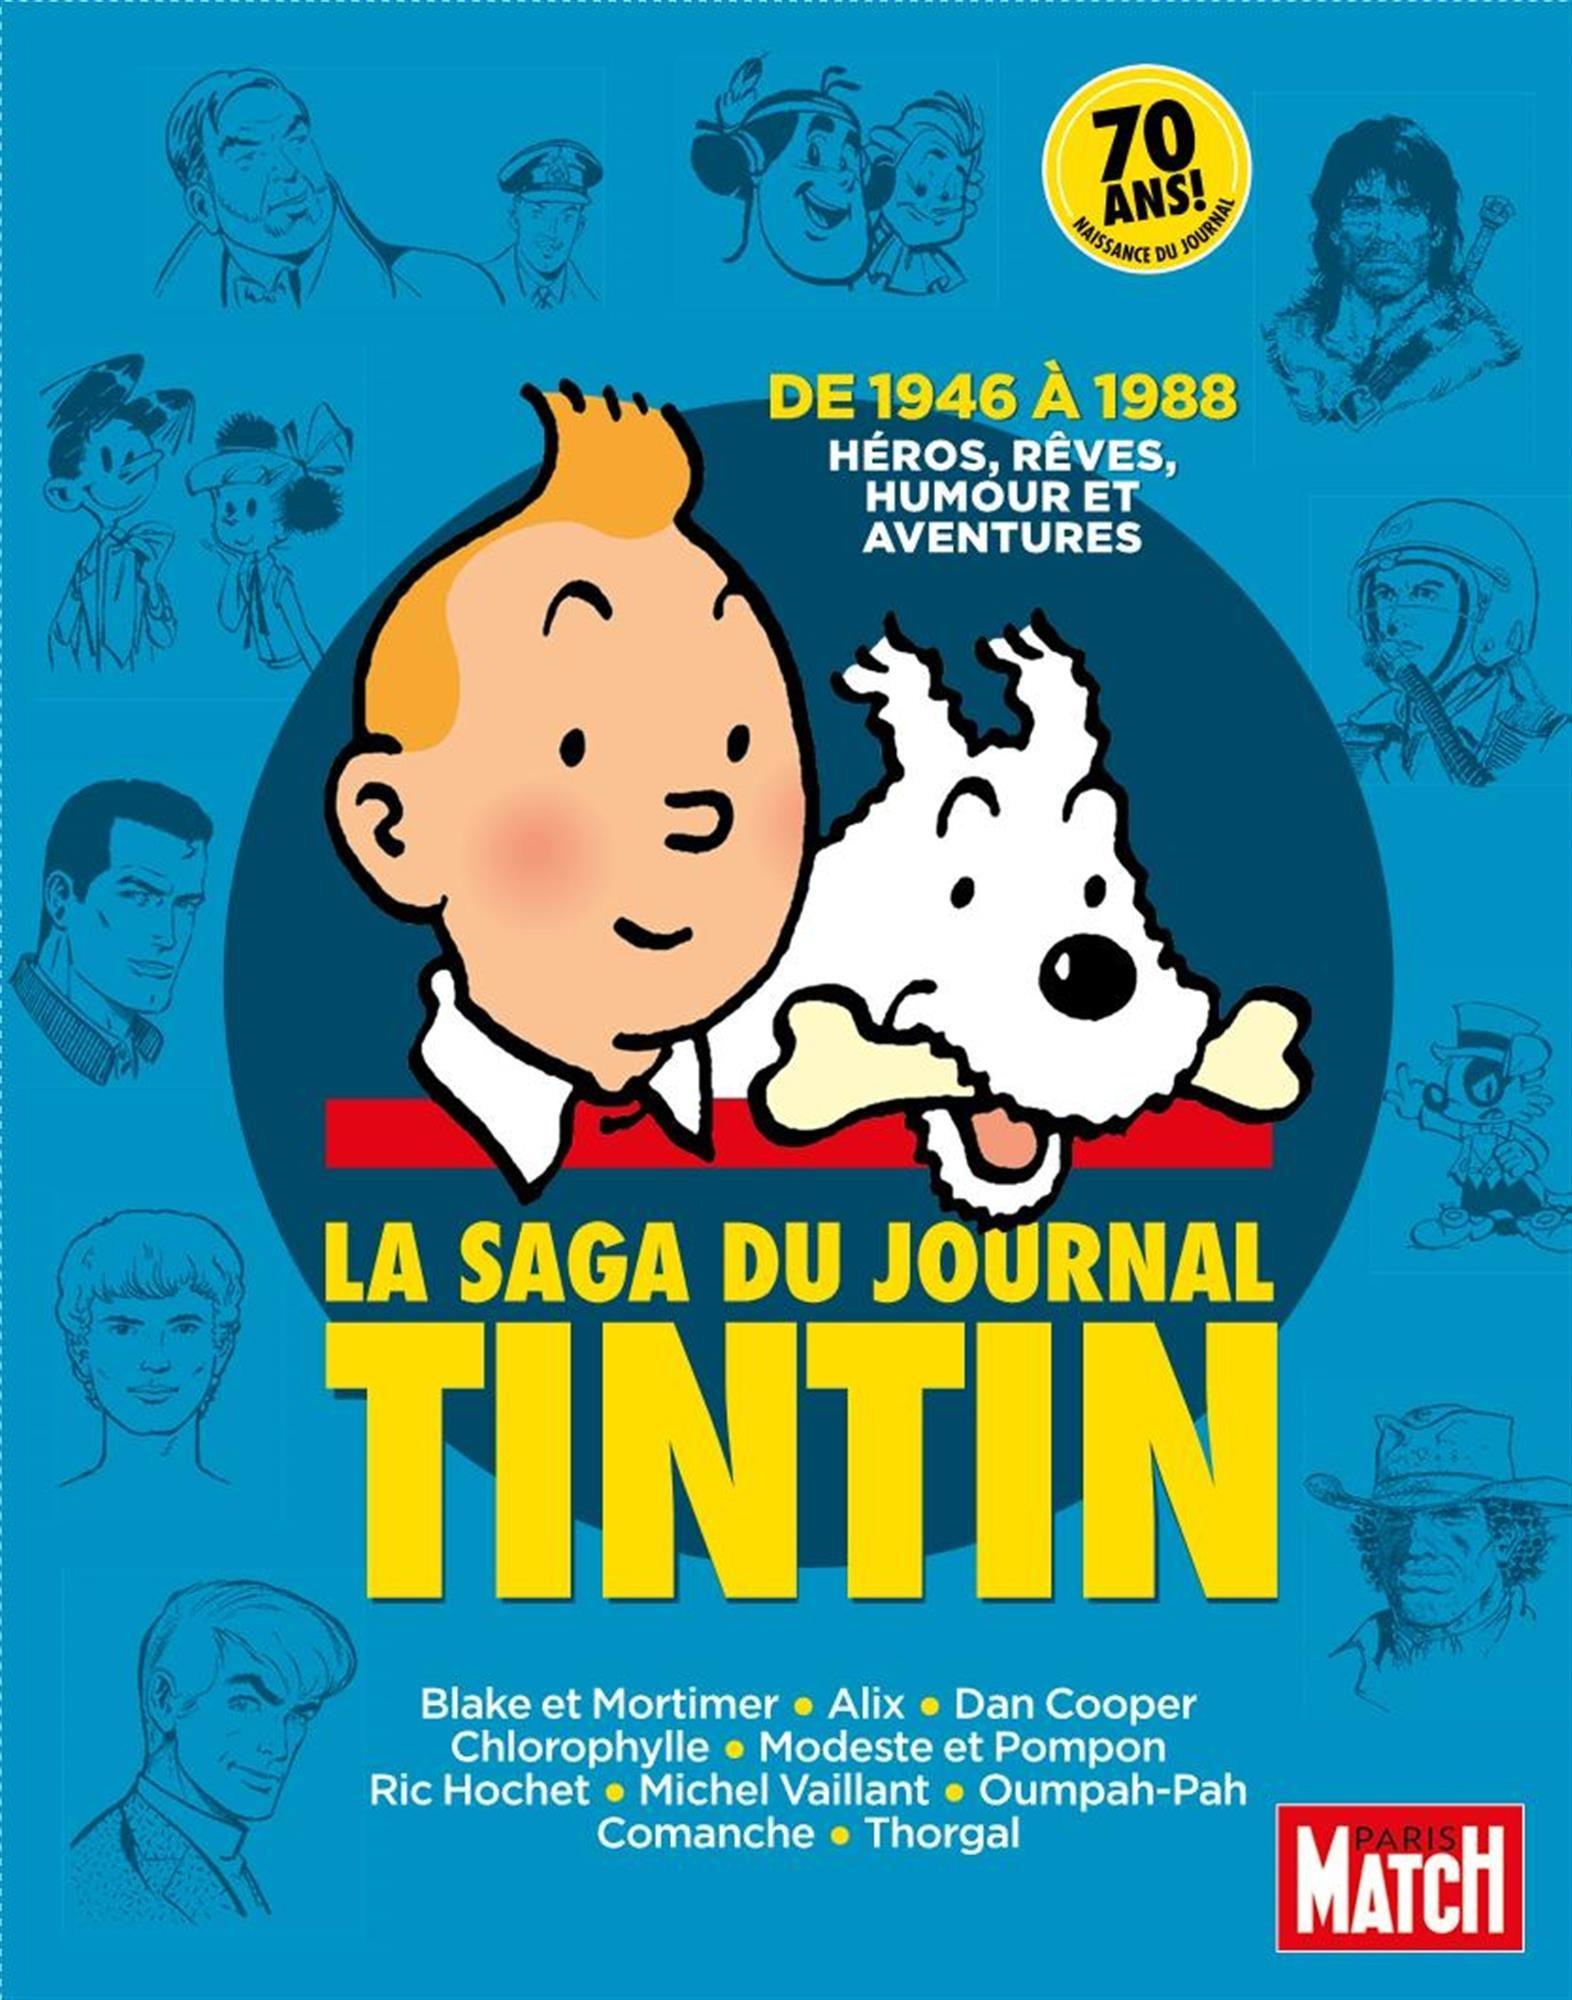 La Saga du Journal Tintin  by  Claude Aziza